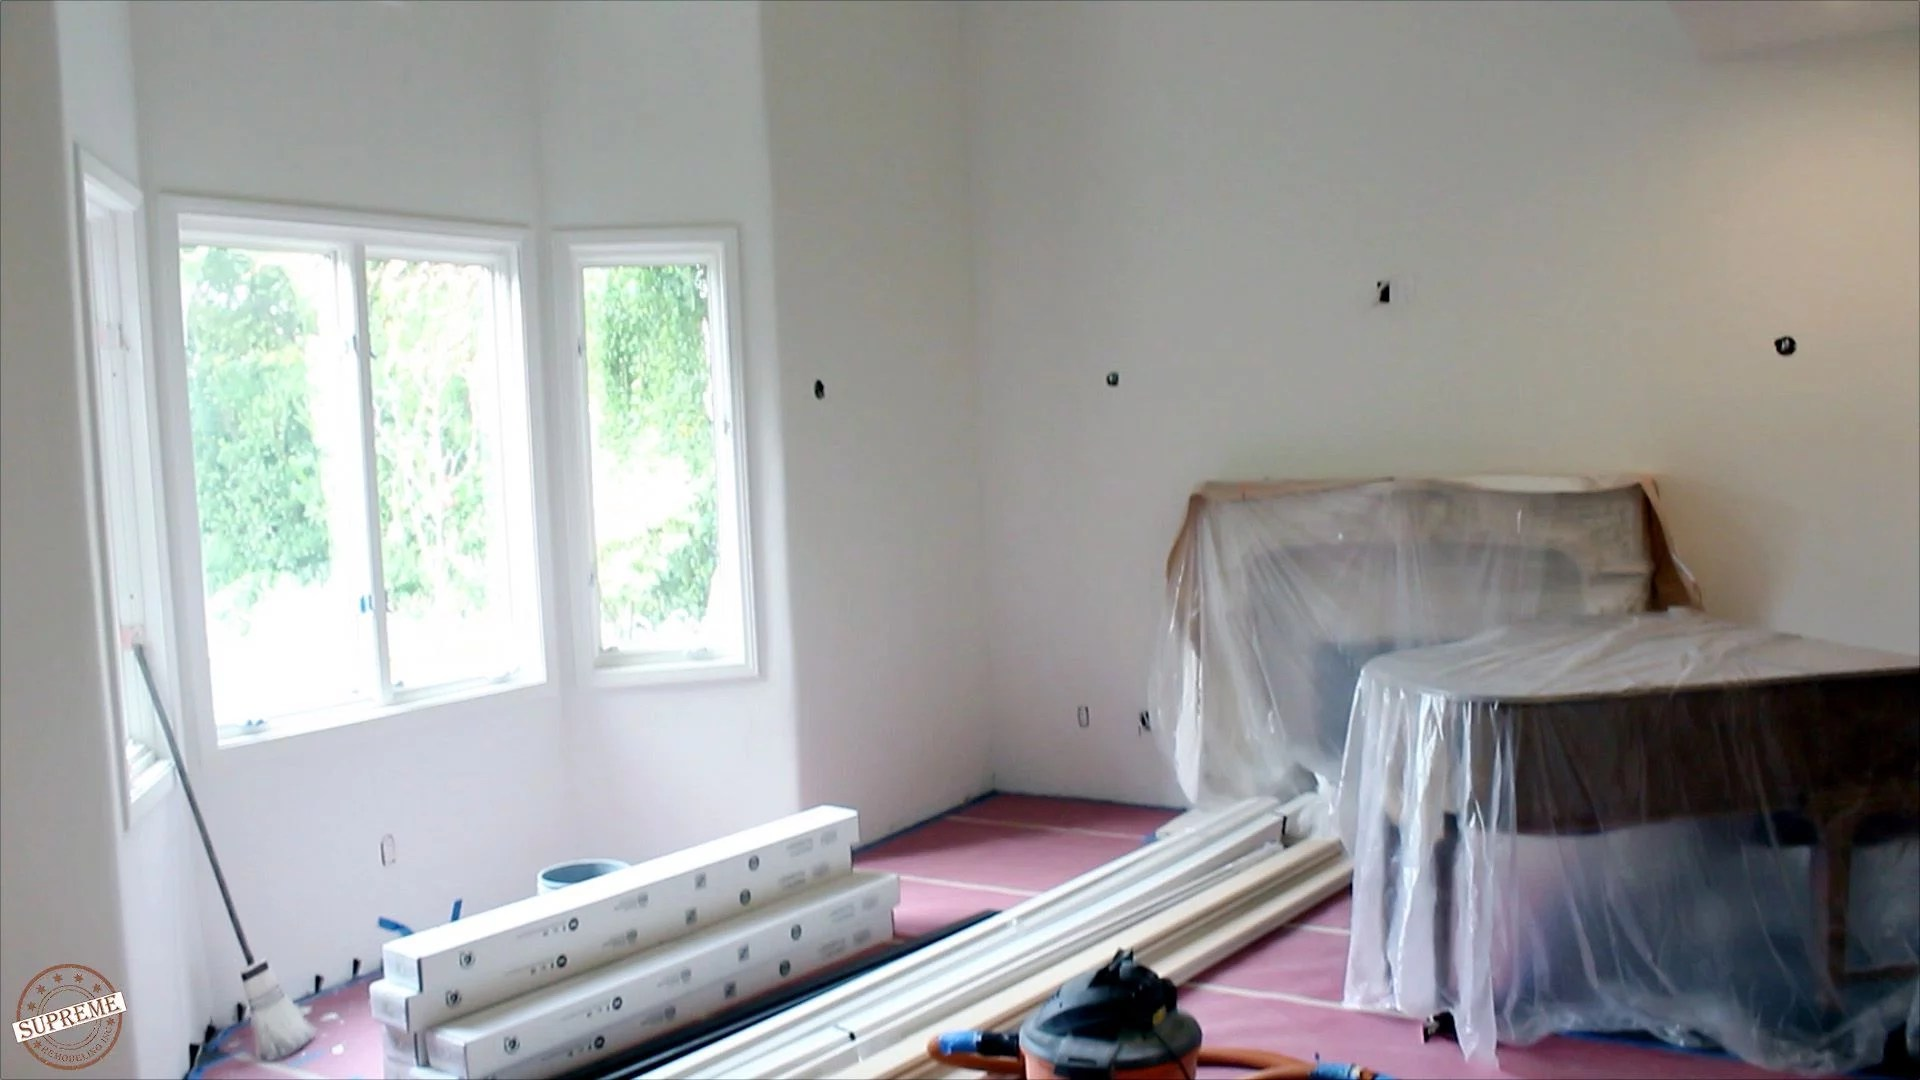 Complete interior remodel